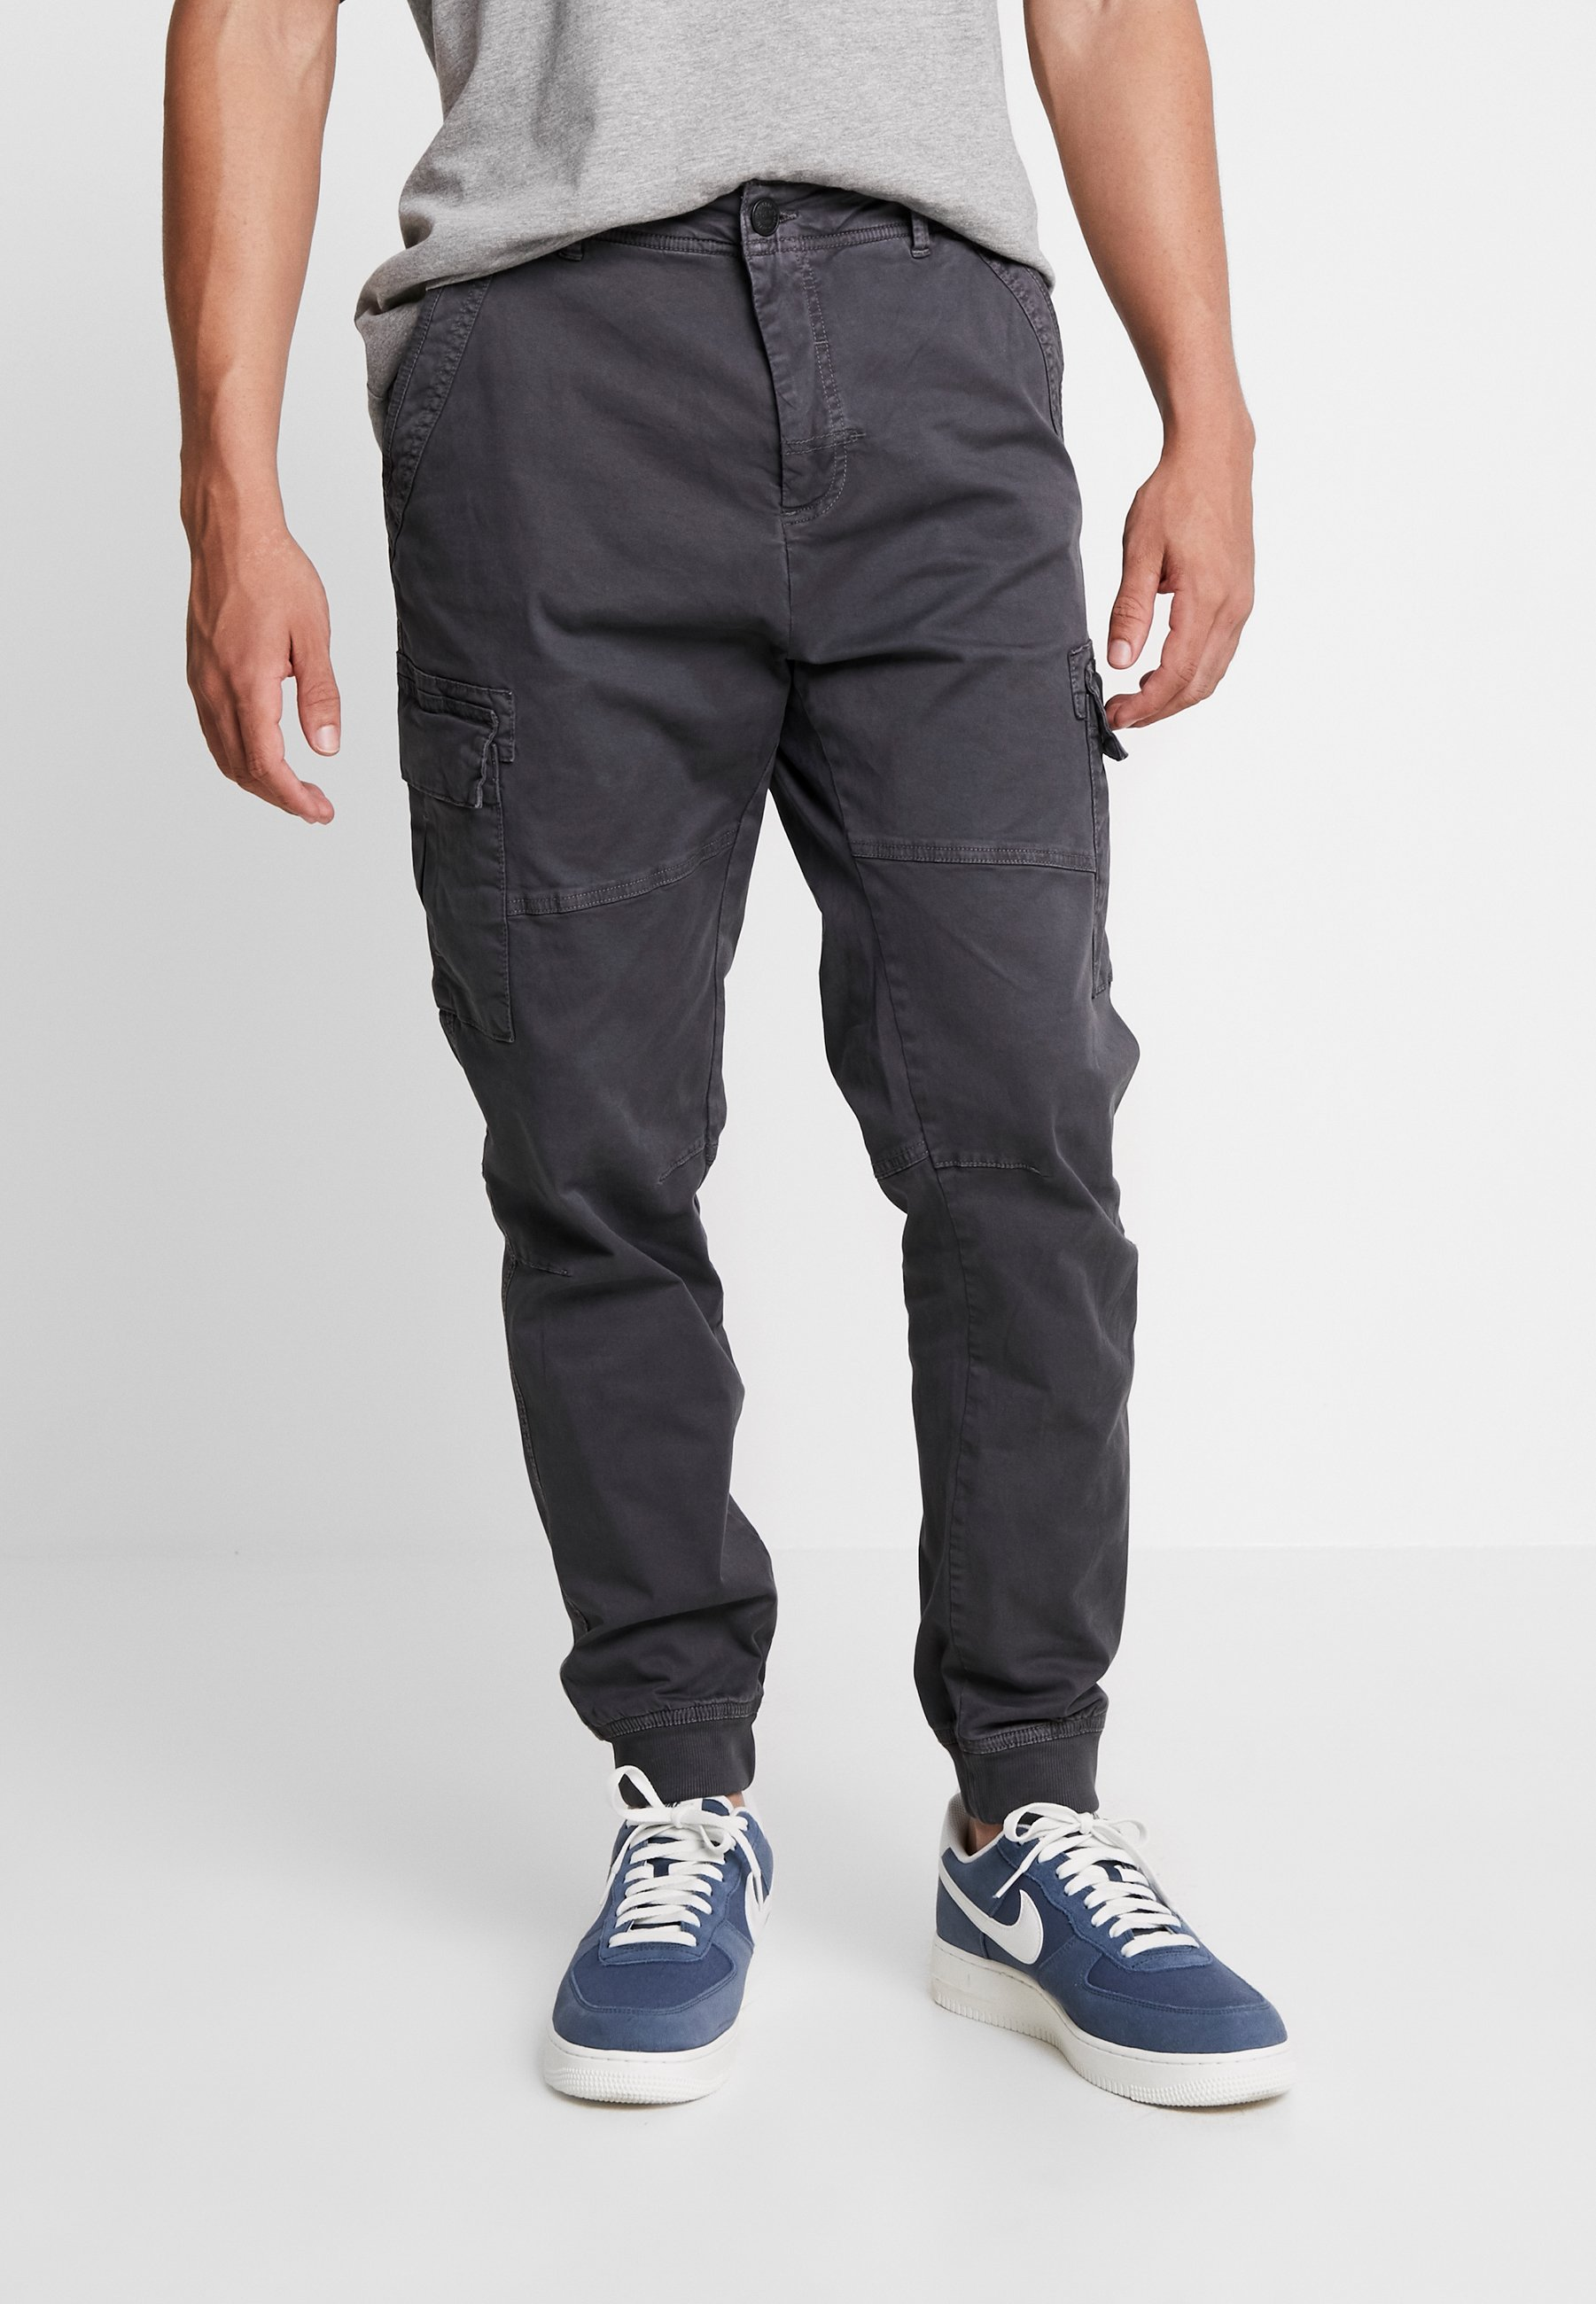 Cargo Ebony Grey Blend PantsPantalon Grey Cargo Ebony Blend PantsPantalon Cargo Blend PantsPantalon W9EIeDYH2